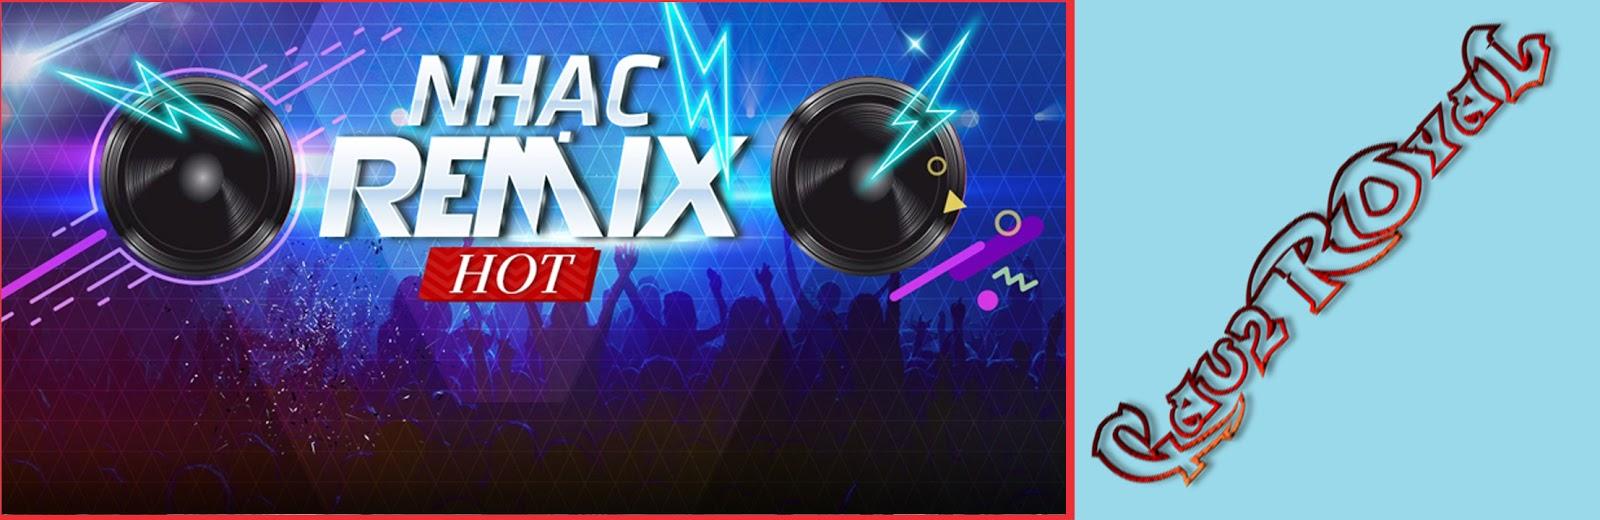 Việt Remix Hot nhất